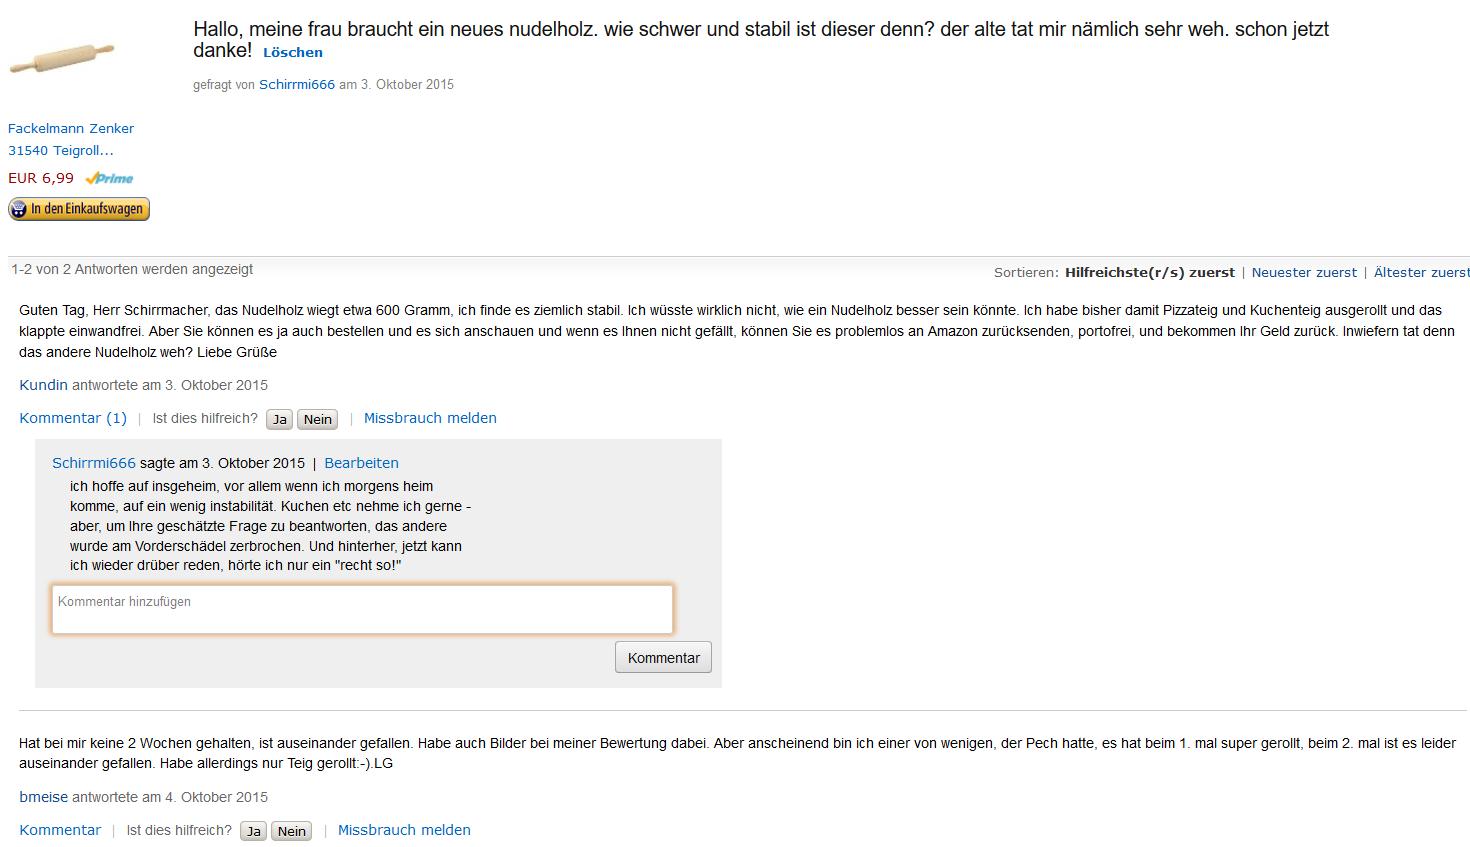 Nudelholz-Dumme-Frage-dumme-Antworten